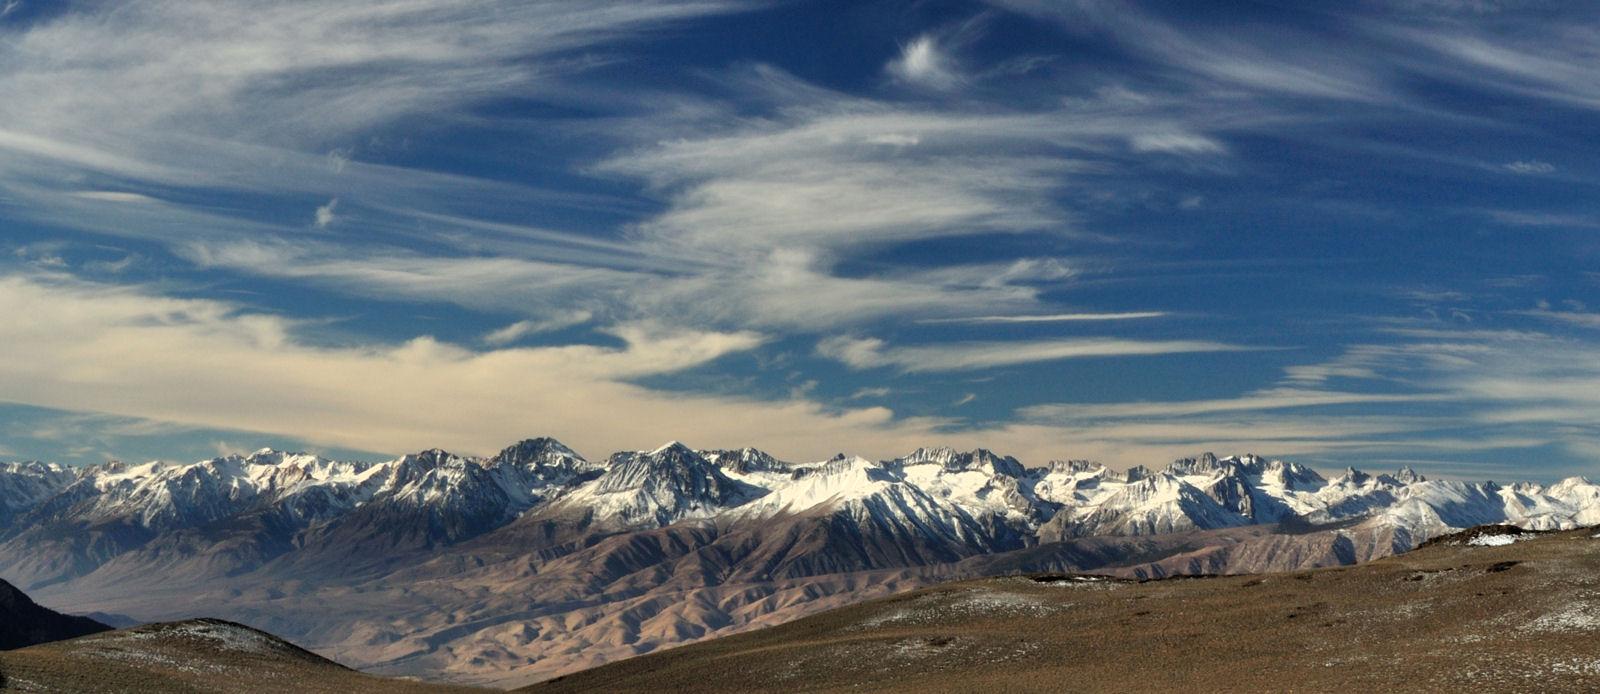 Inyo-White Mountains_panoráma 3000 m magasan.JPG